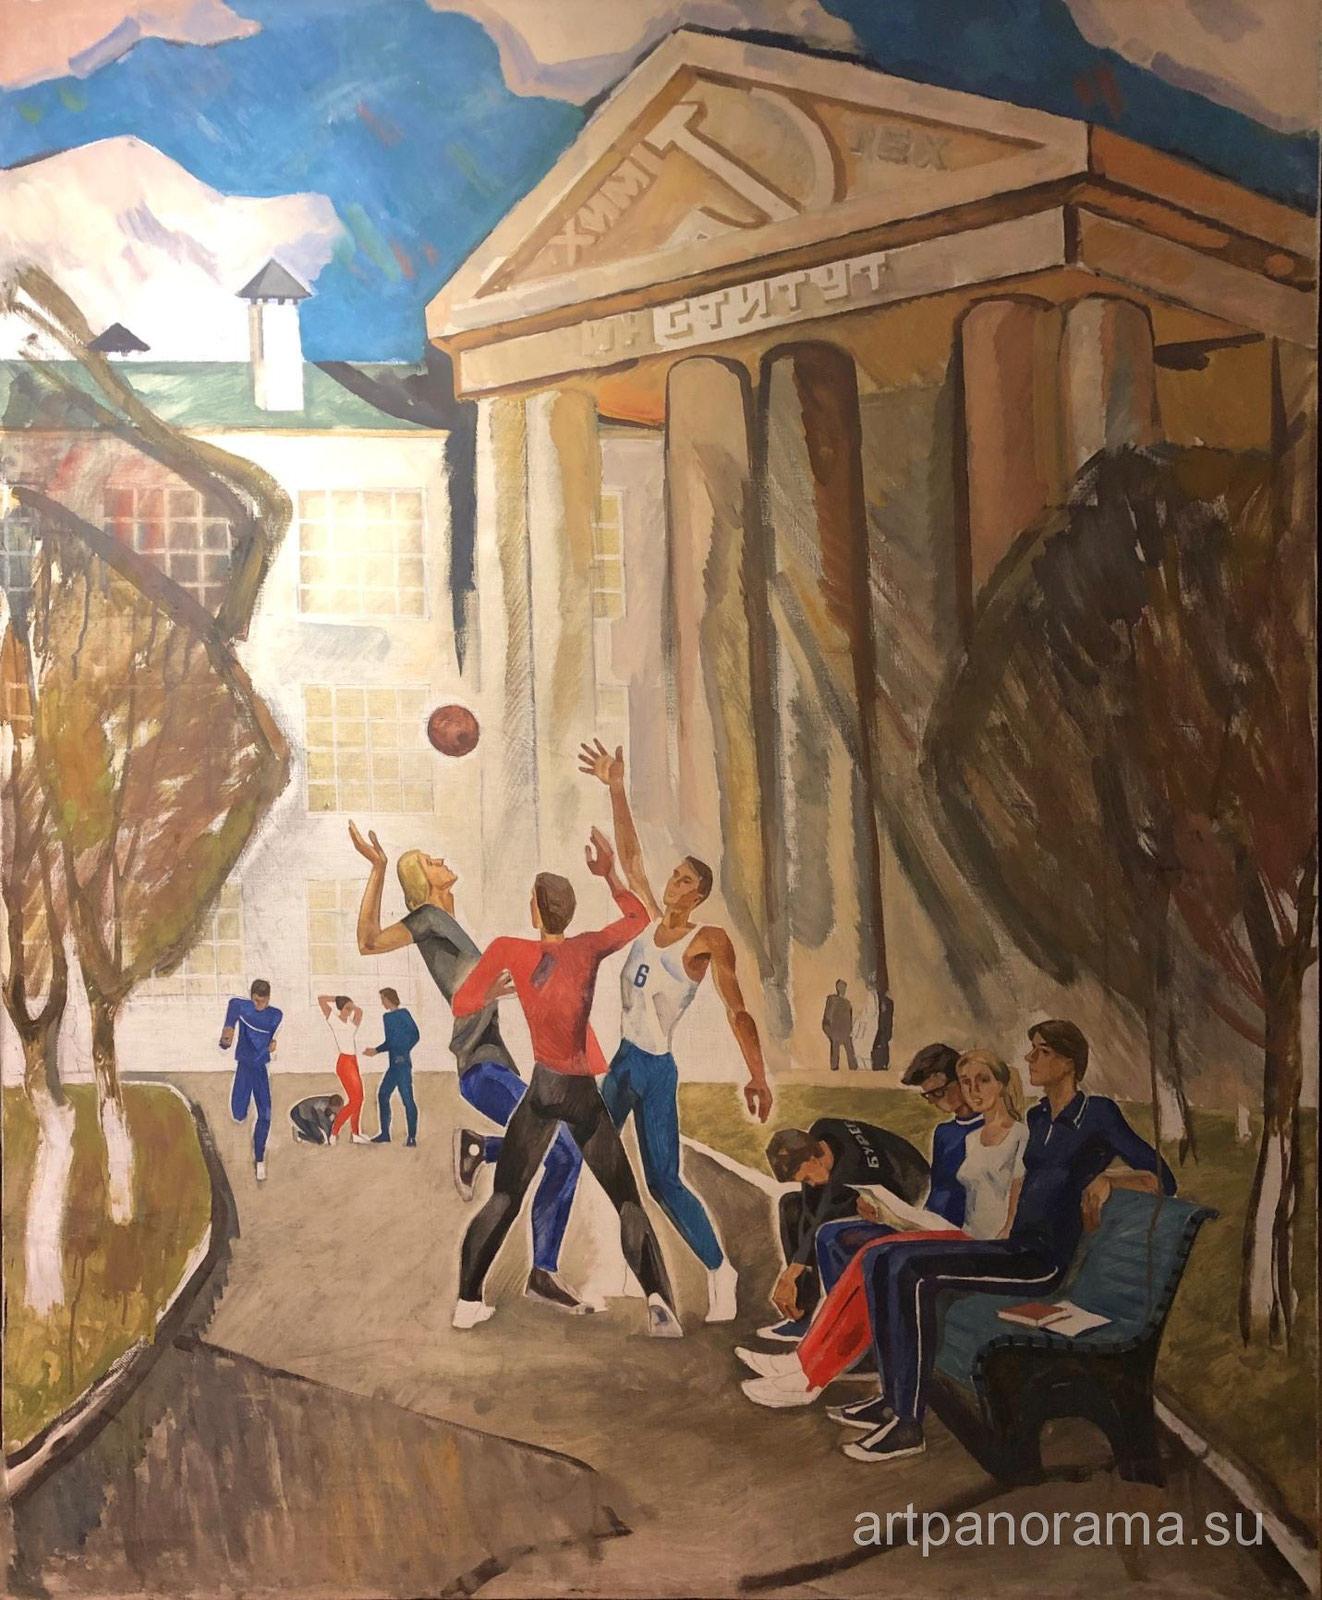 Художественная галерея АртПанорама (Пречистенка) — отзывы ...